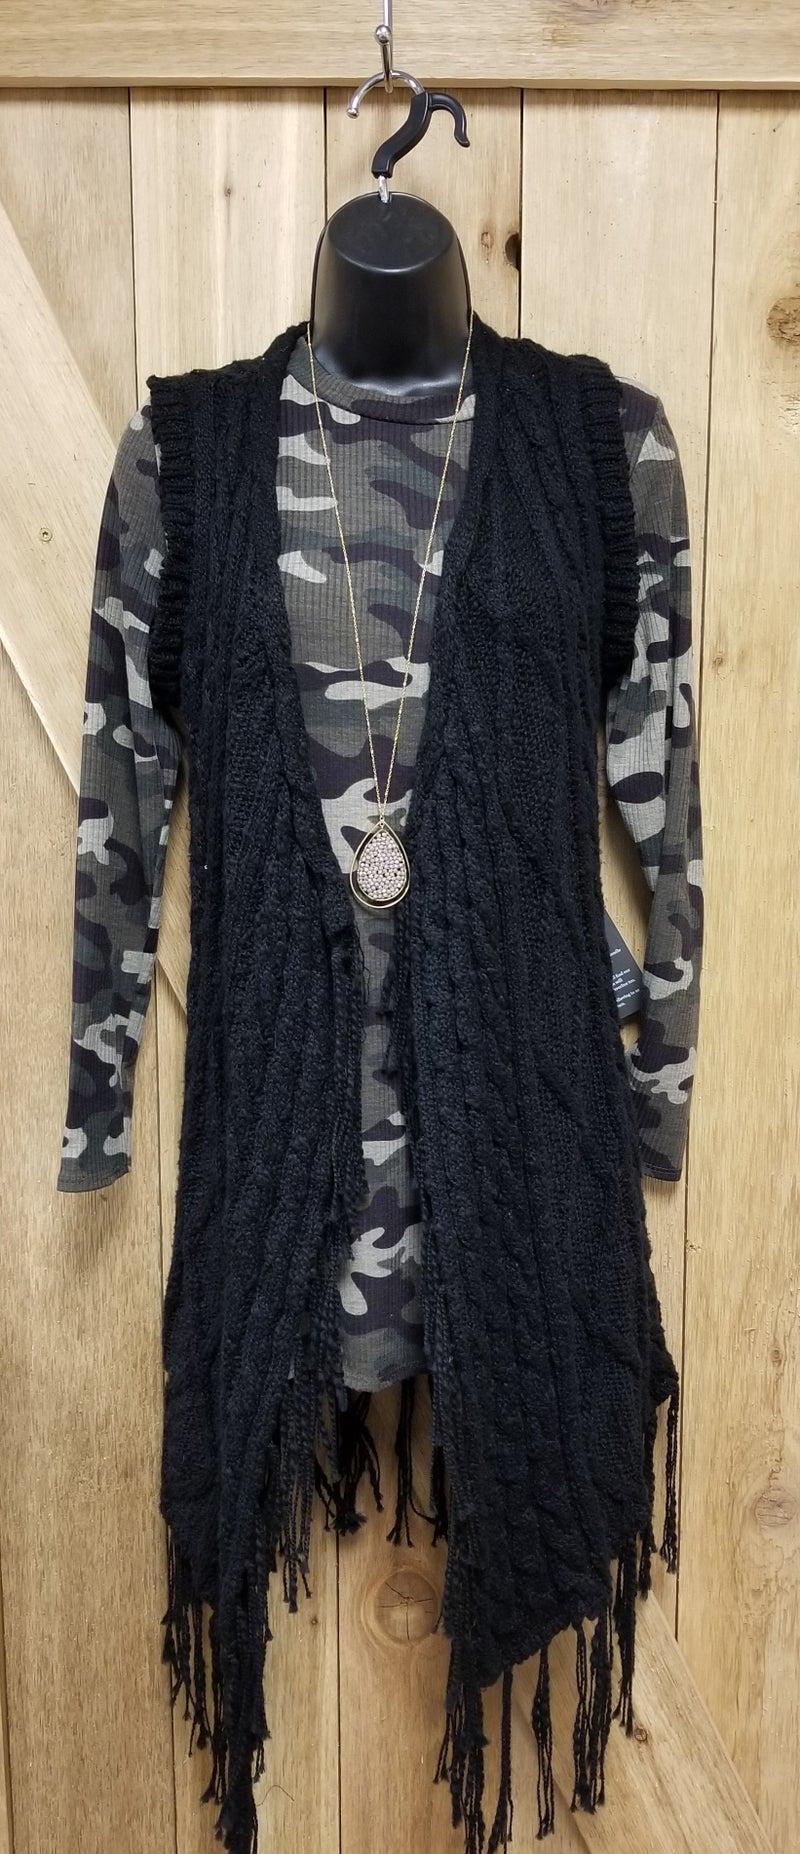 Powder River Black Knit Long Vest